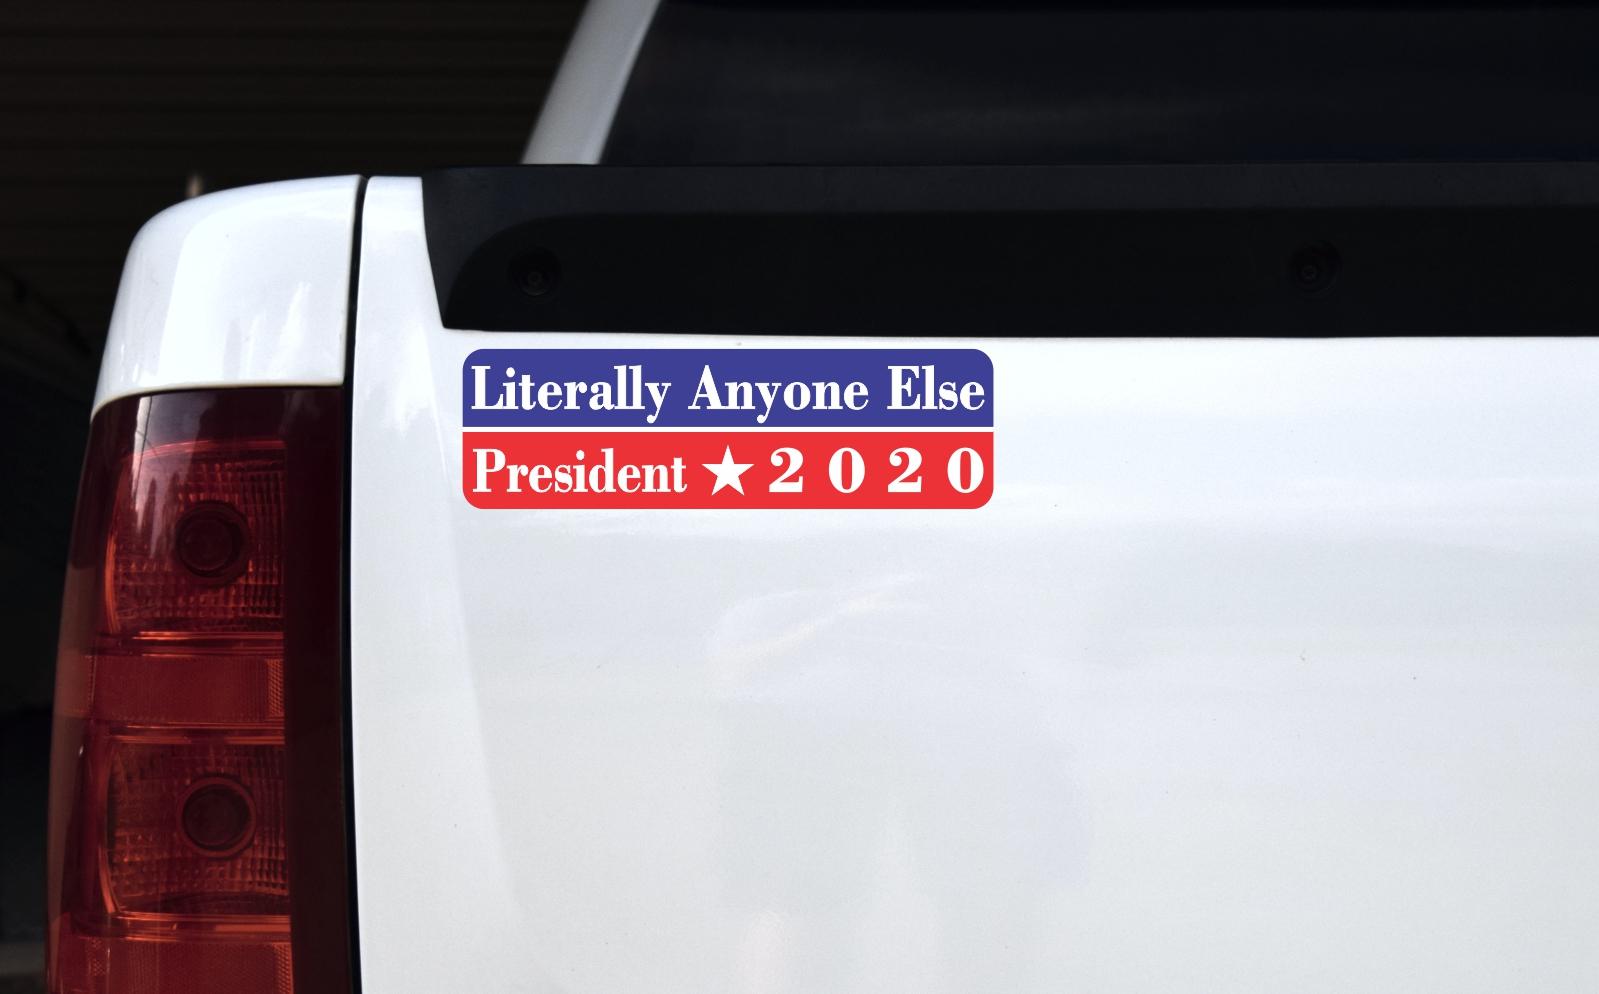 MAGNET literally anyone else 2020 Magnetic Vinyl Car Bumper Sticker 5